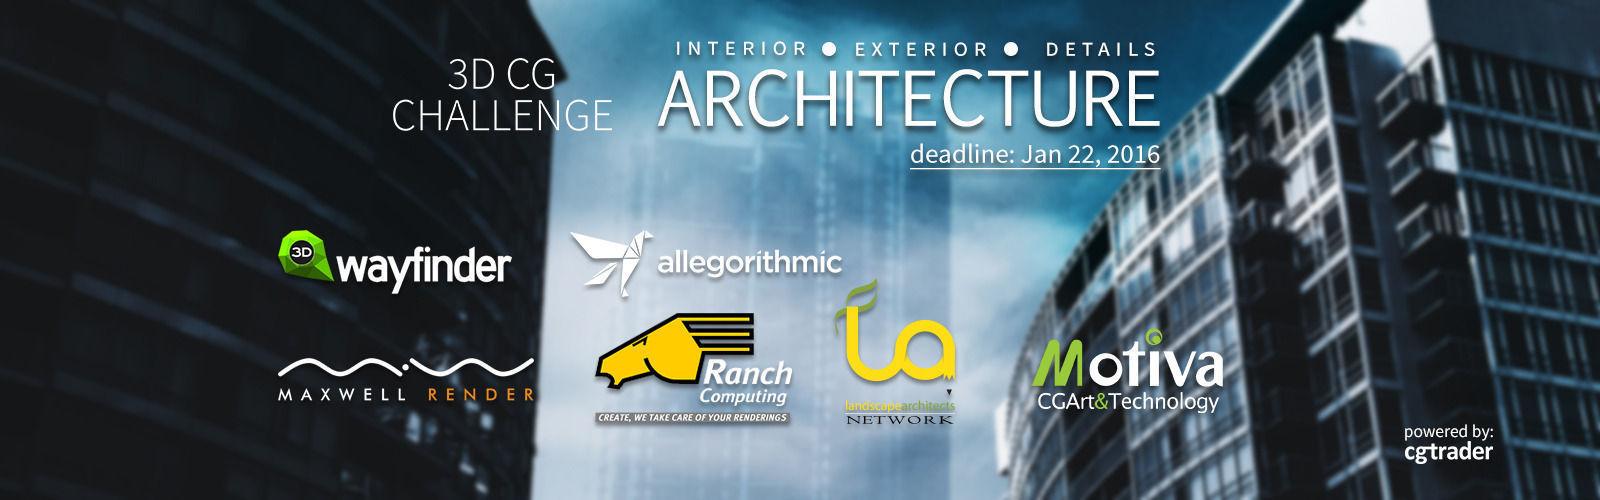 CG Architecture Challenge